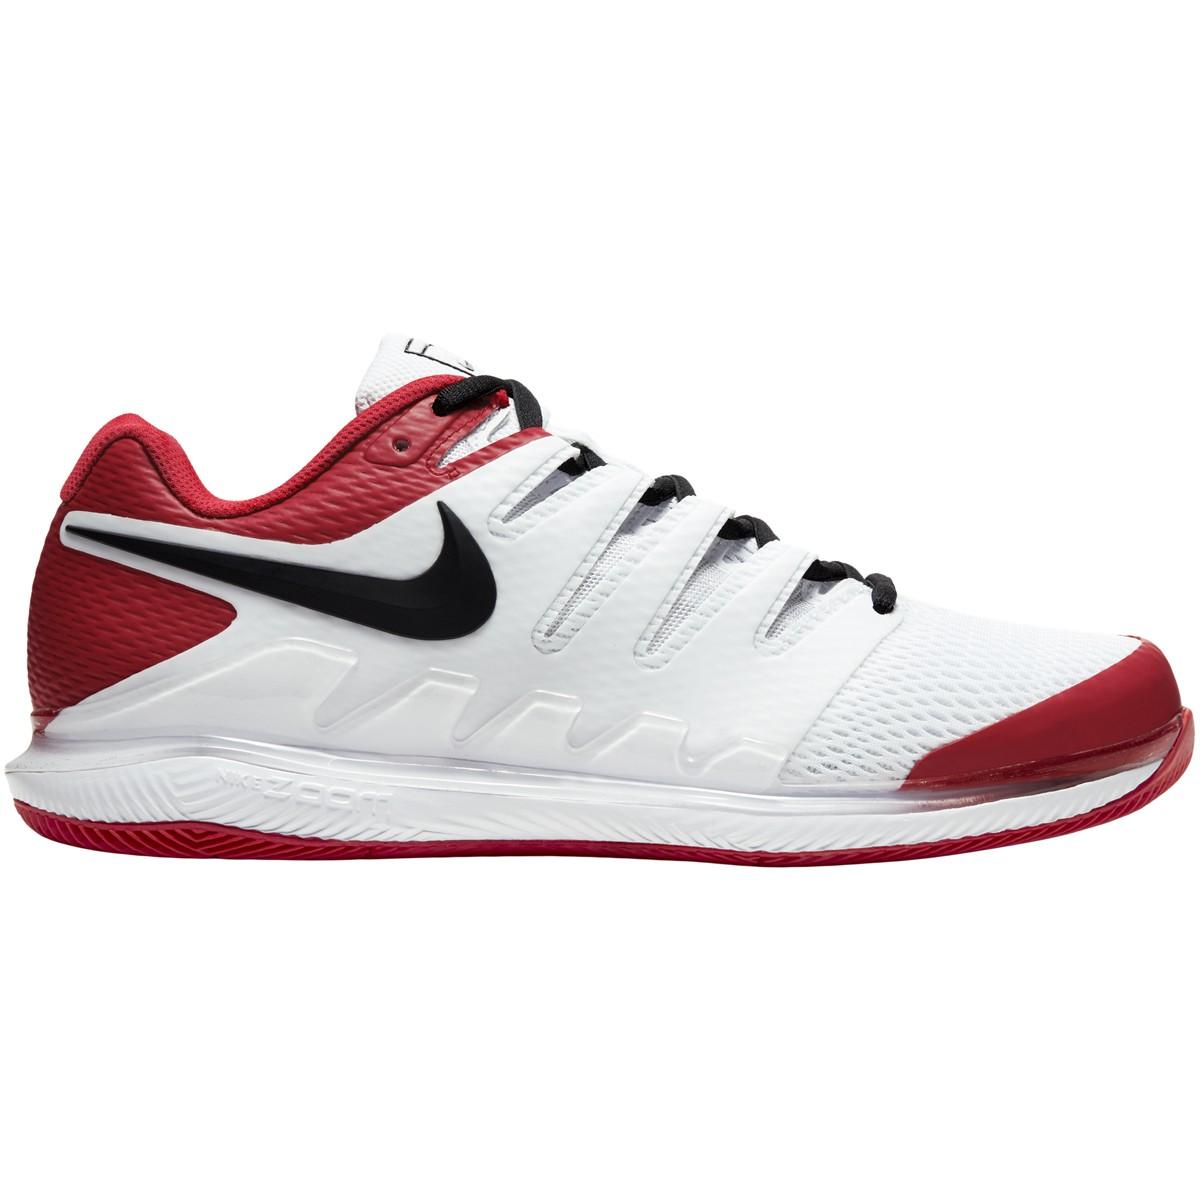 Nike Air Zoom Vapor X Scarpa Per Tutte Le Superfici Uomini